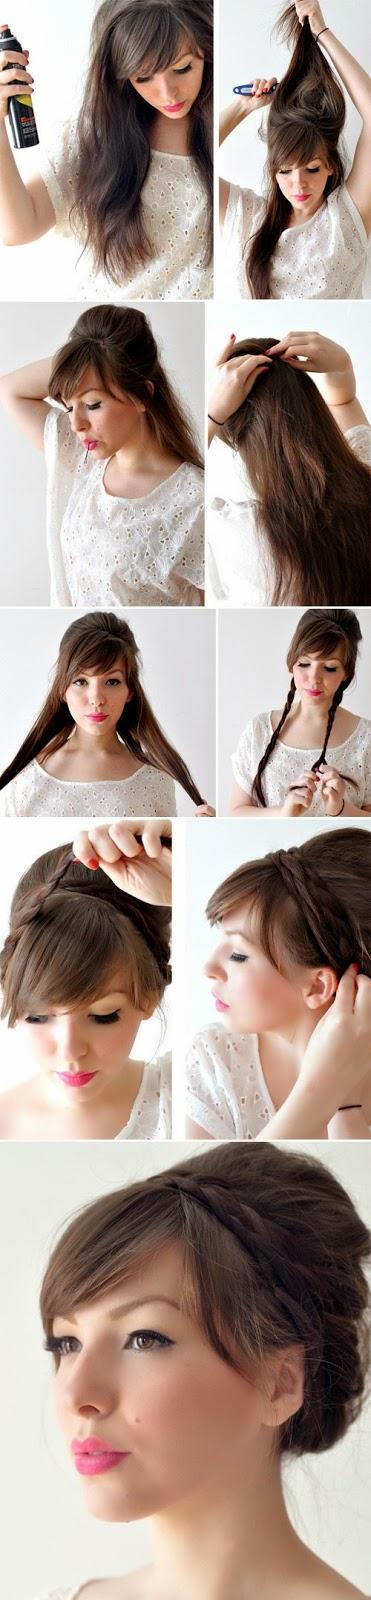 hairstyles, hair, short hairstyles, short haircuts, haircut, hair color, hair cuttery, short hair